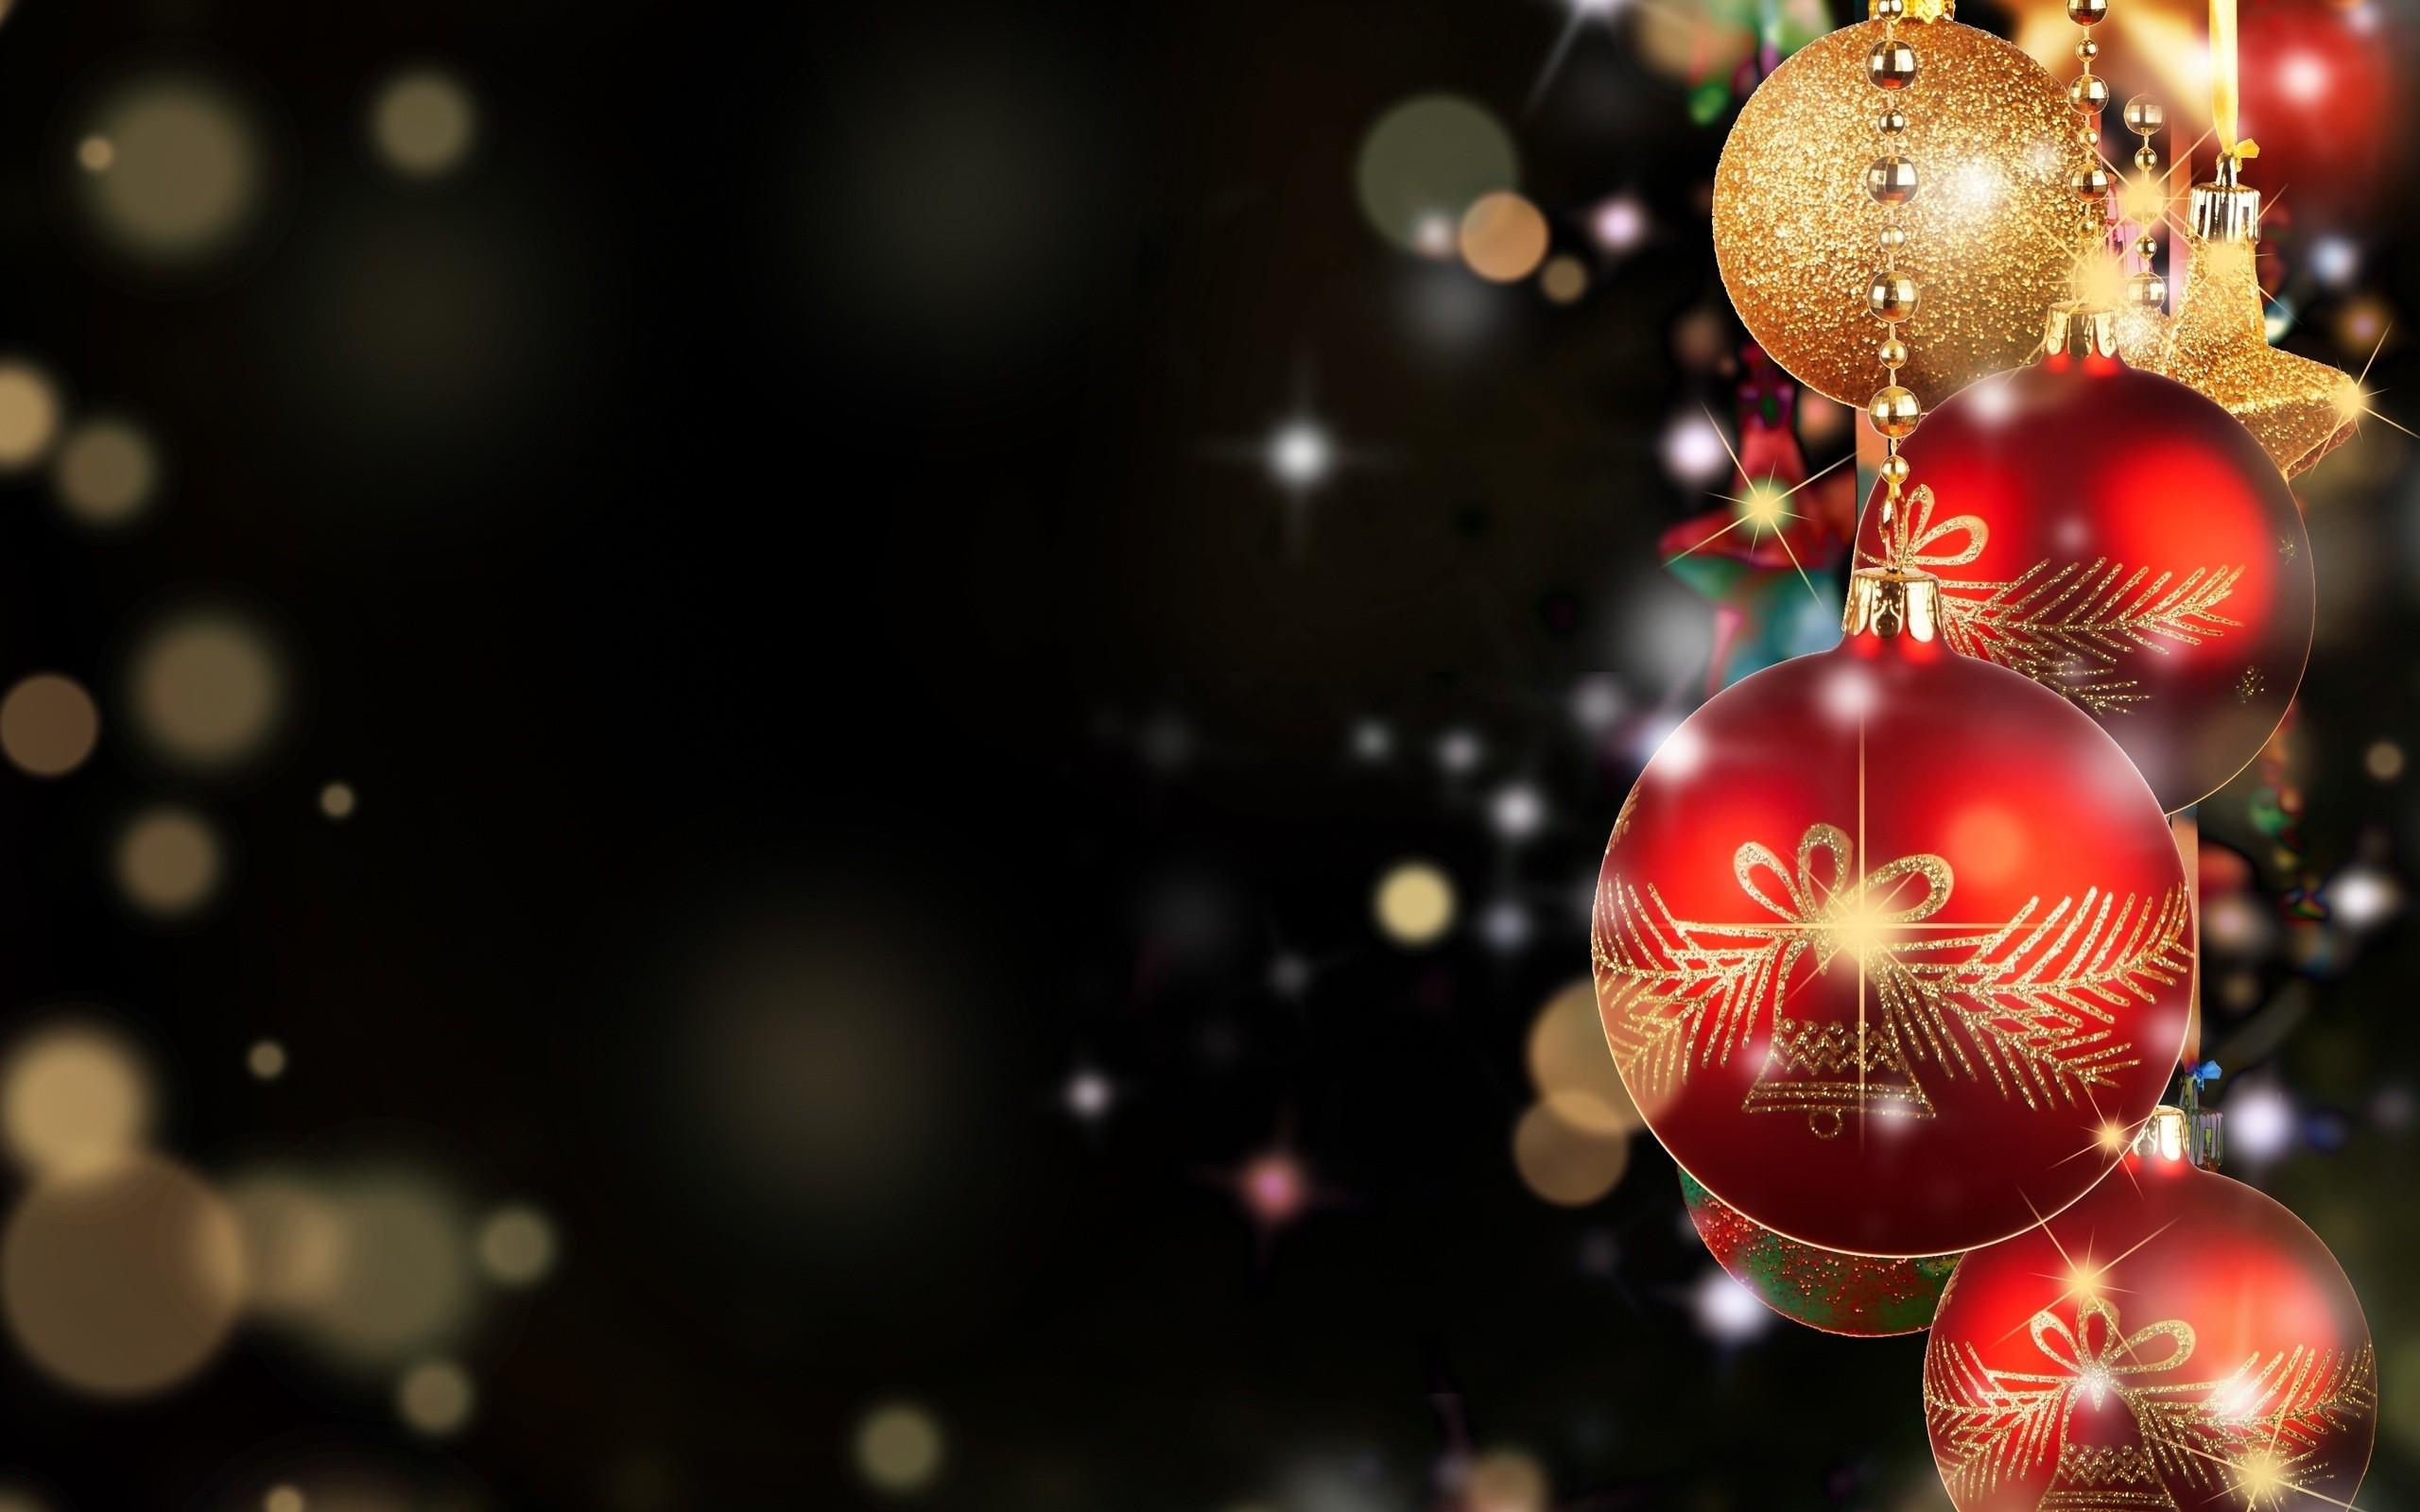 Res: 2560x1600, Christmas Wallpaper HD.